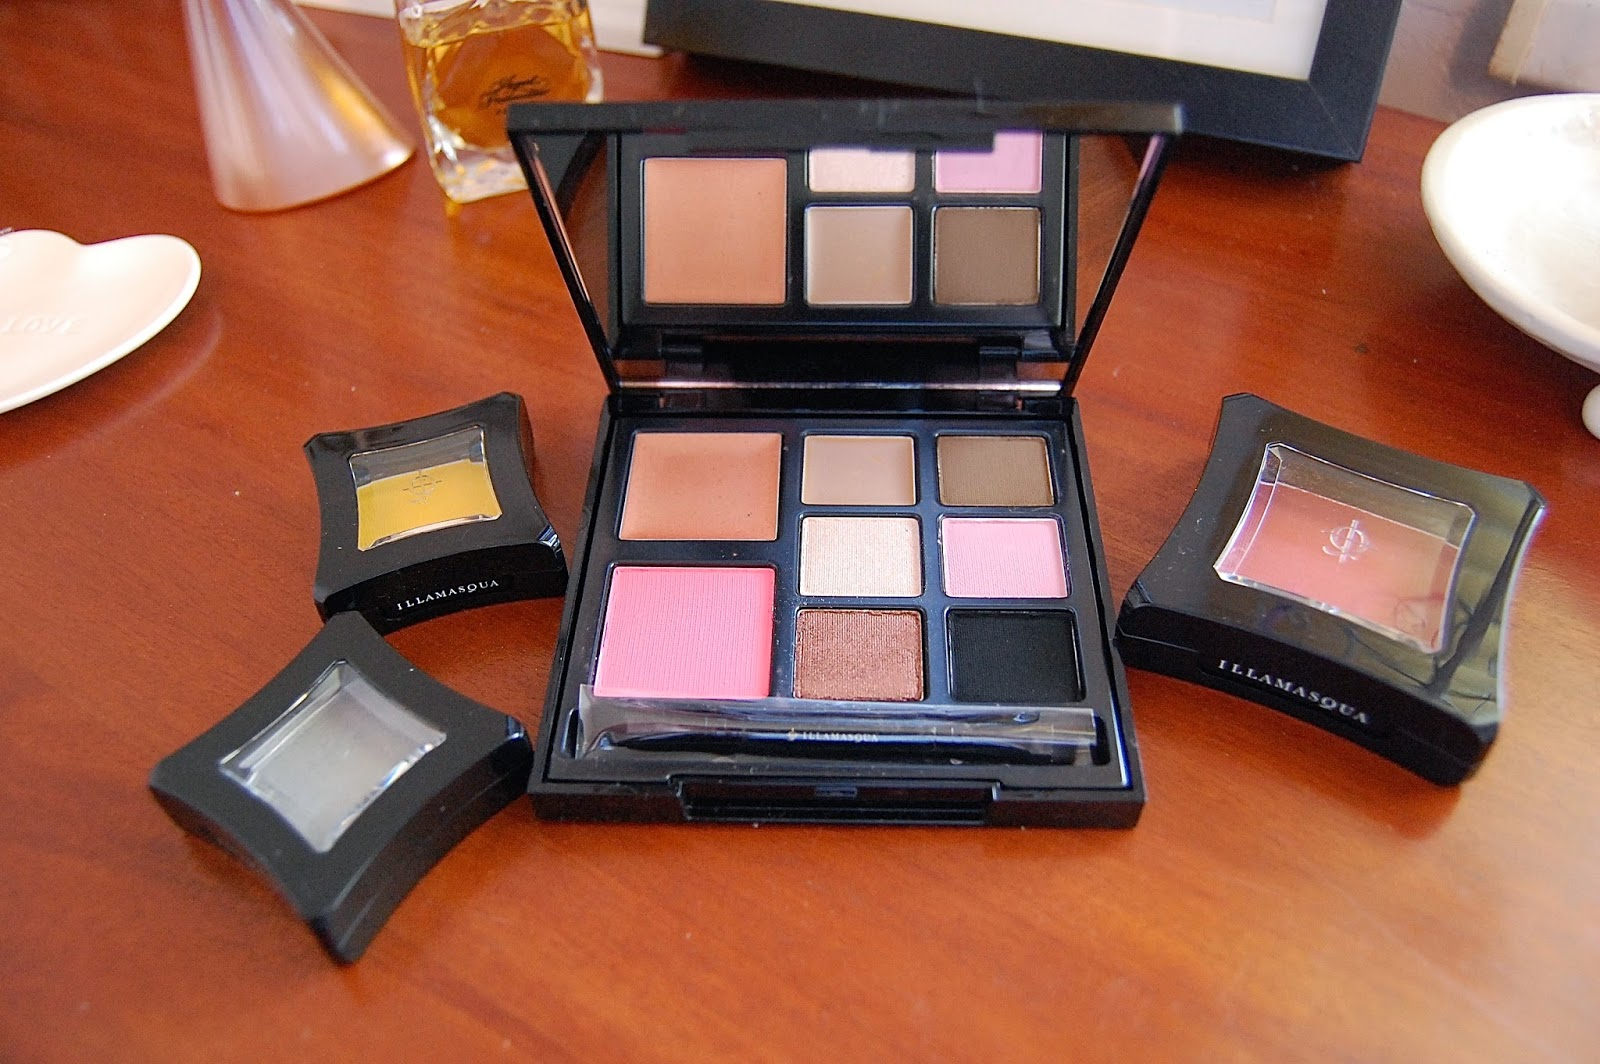 illamasqua, eyeshadow, blush, multi facets, bbloggers, beauty, make up, review